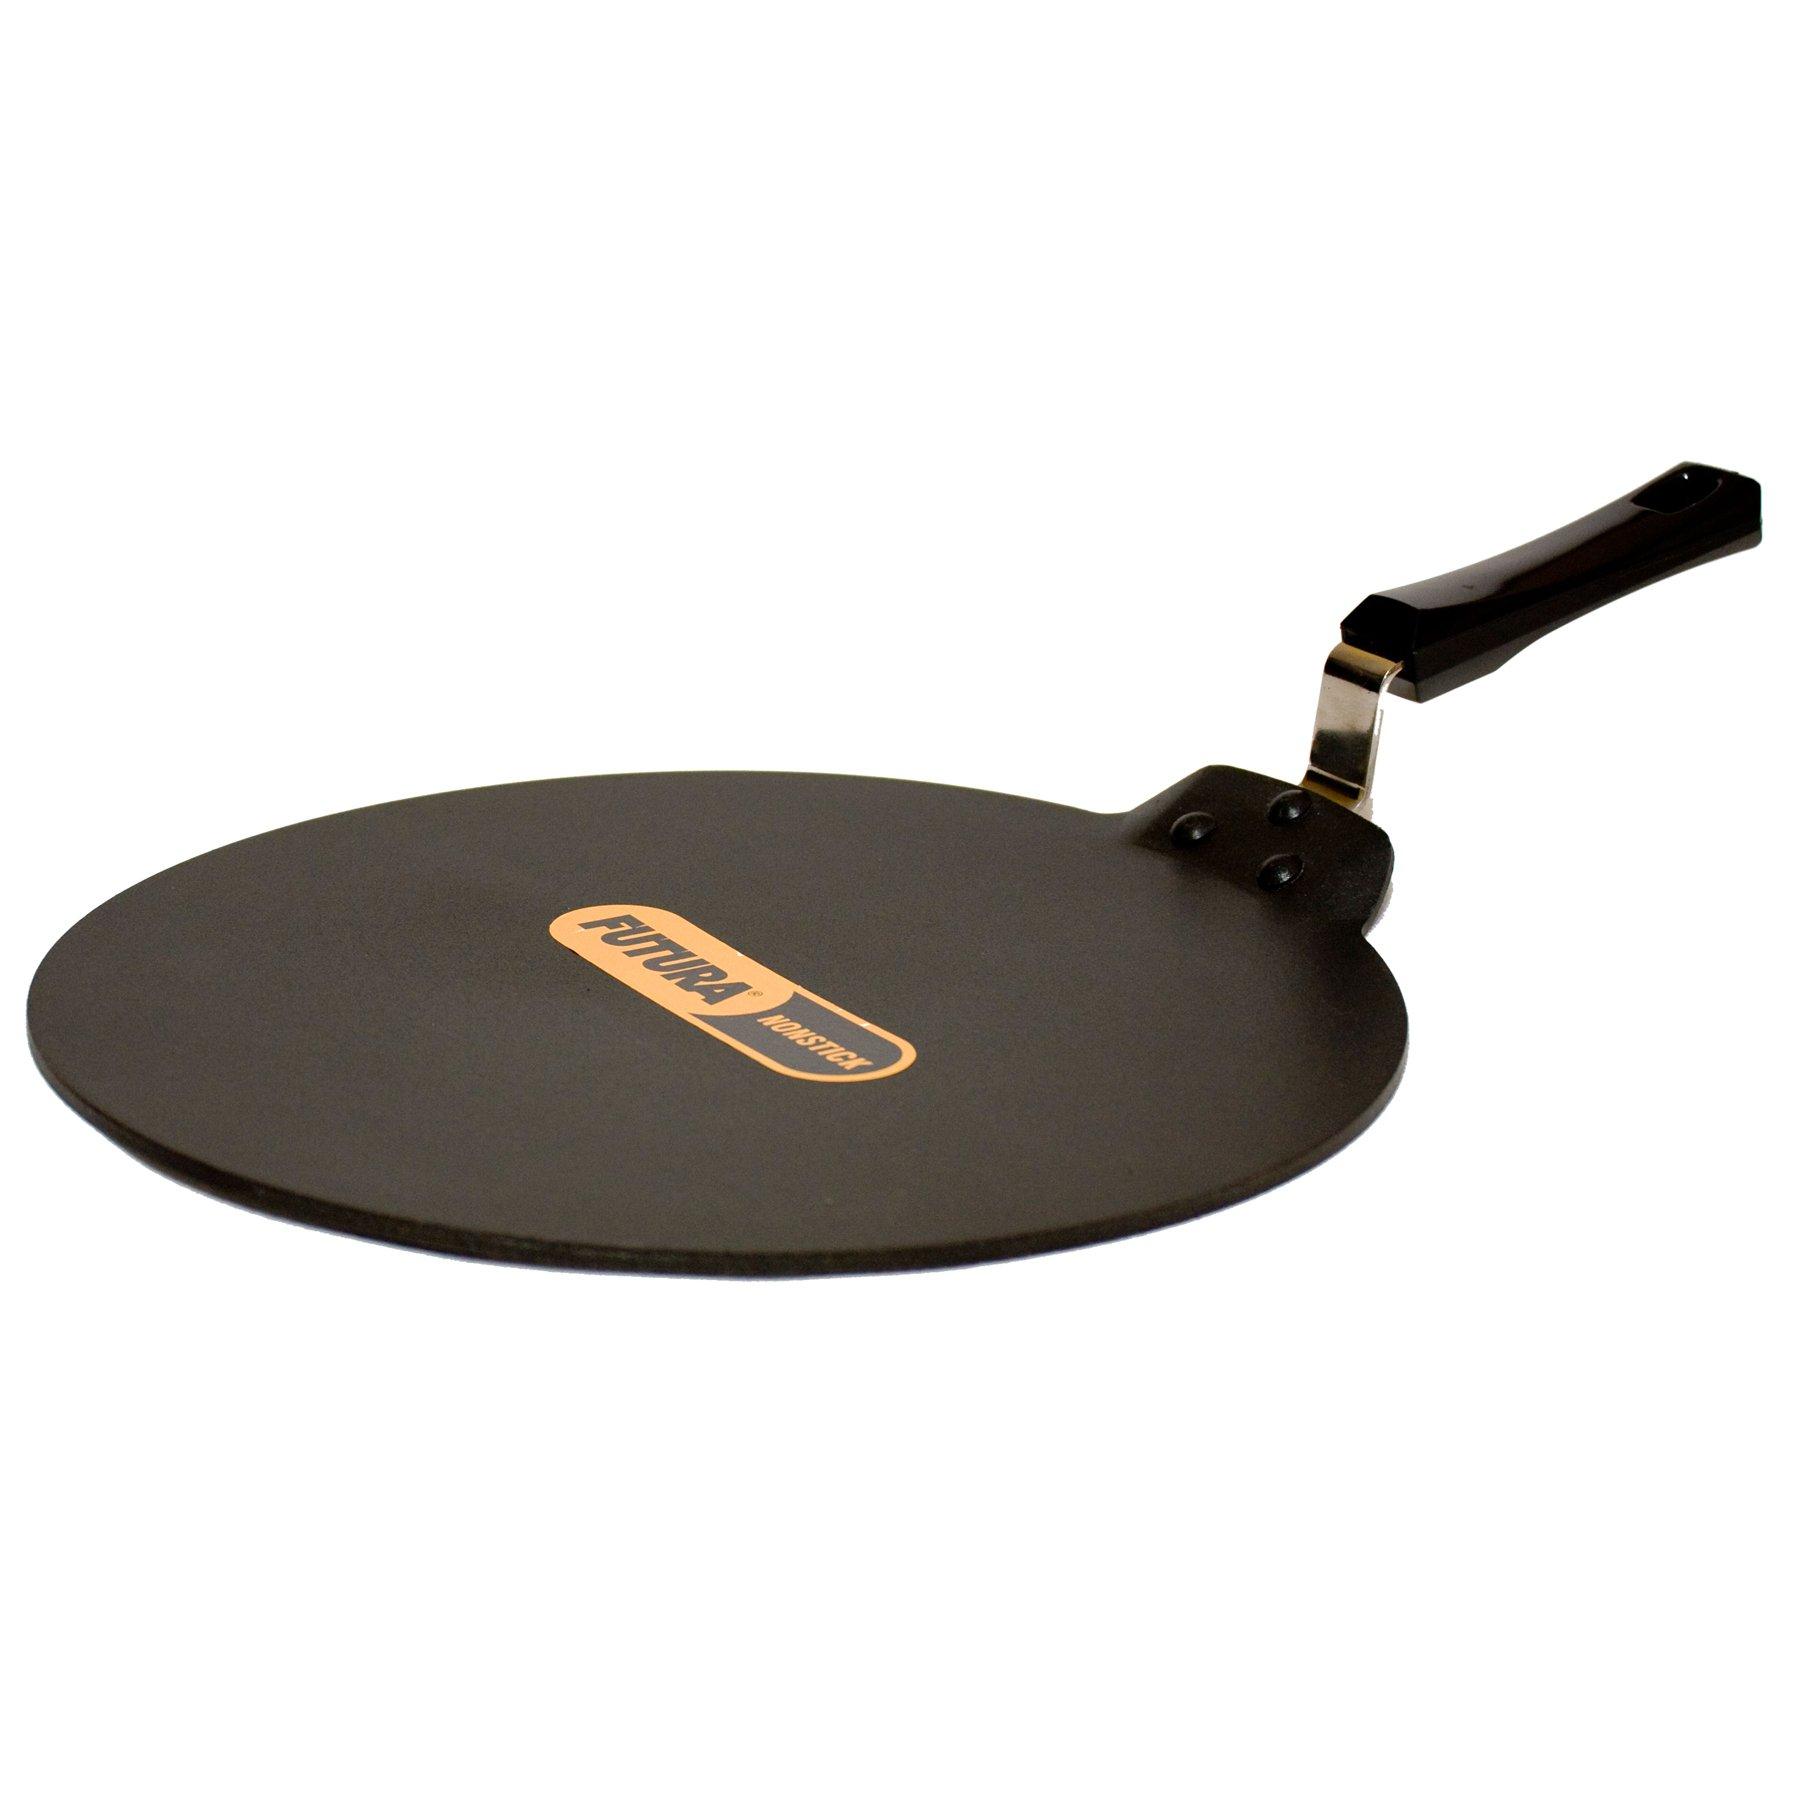 Futura Q41 Nonstick Flat Dosa Tava/Griddle, 13-Inch